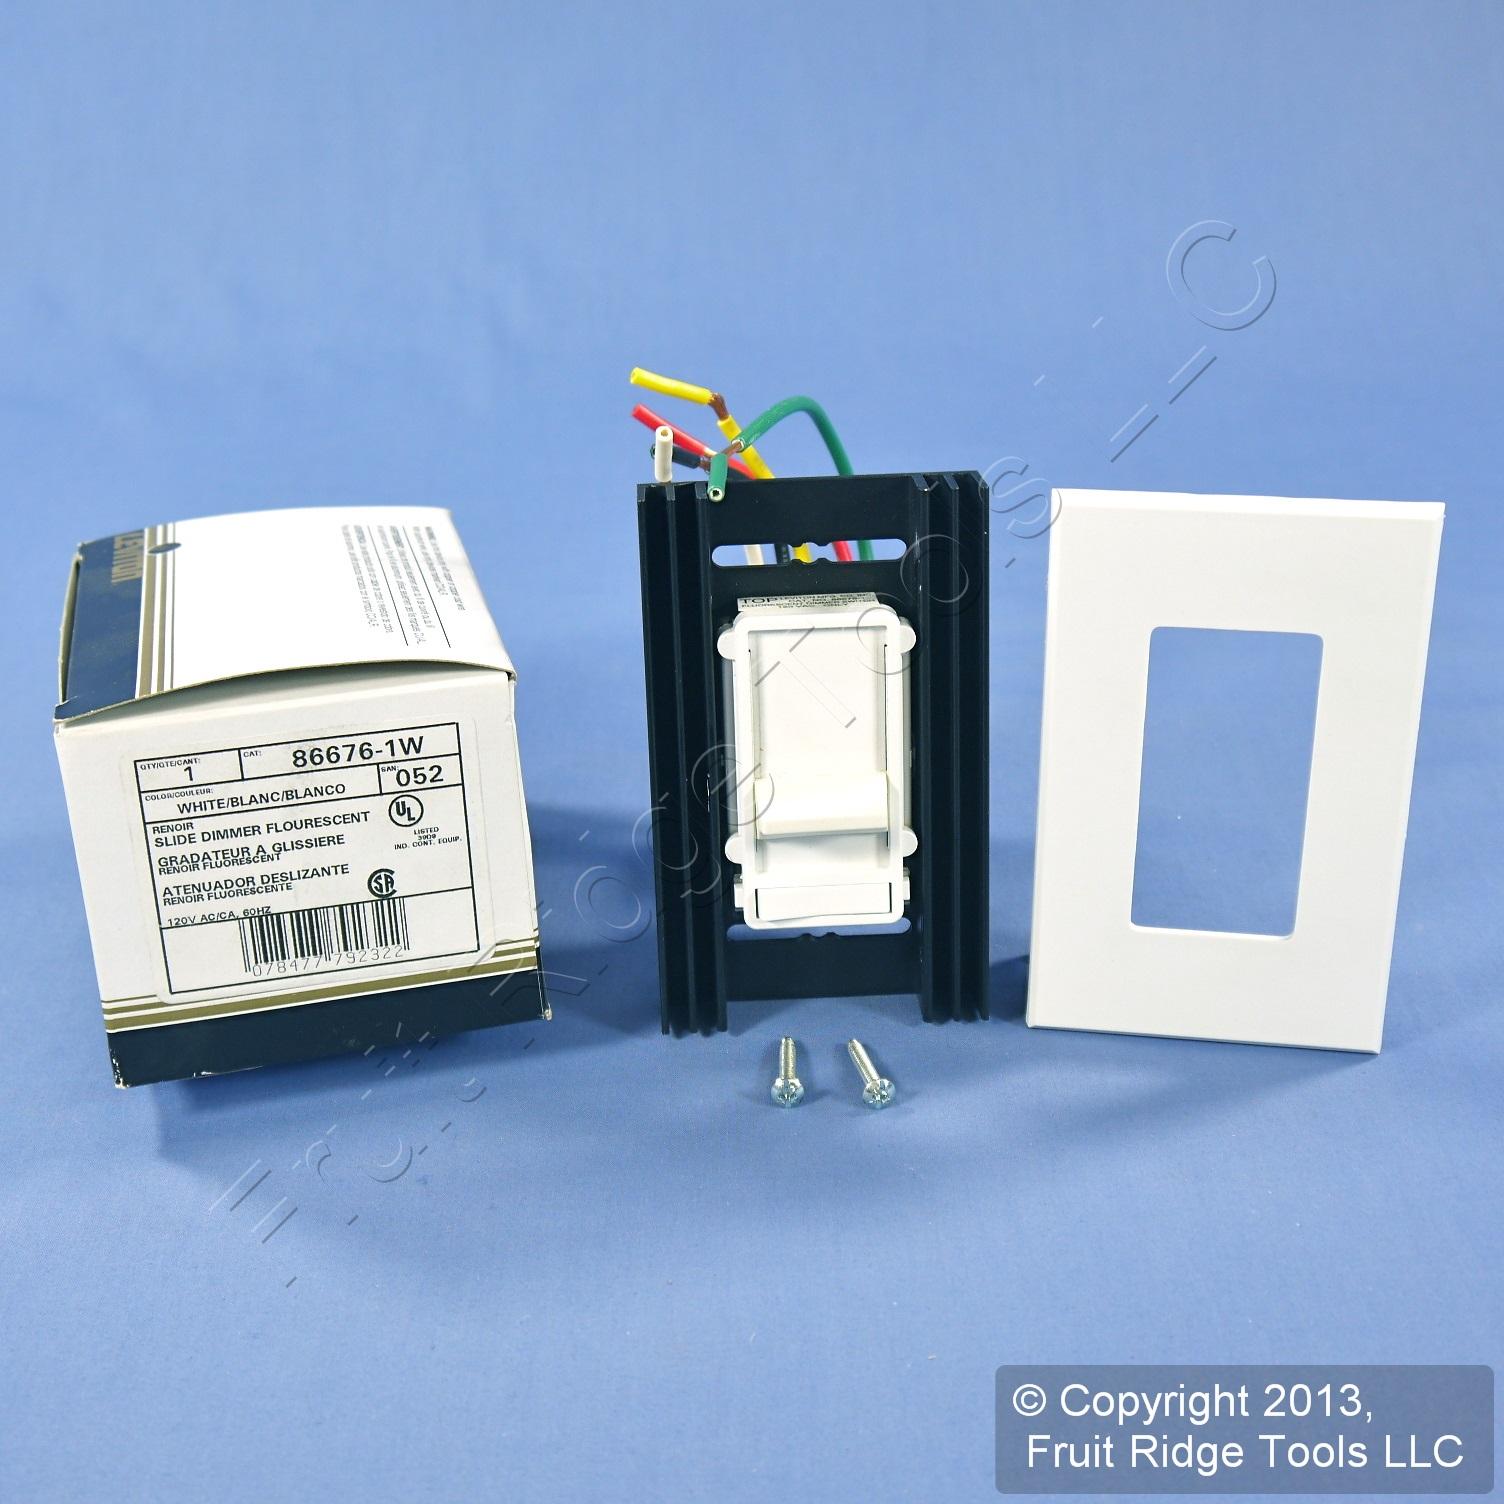 fluorescent white slide light dimmer switch 120v 2 12 lamp 86676 1w. Black Bedroom Furniture Sets. Home Design Ideas